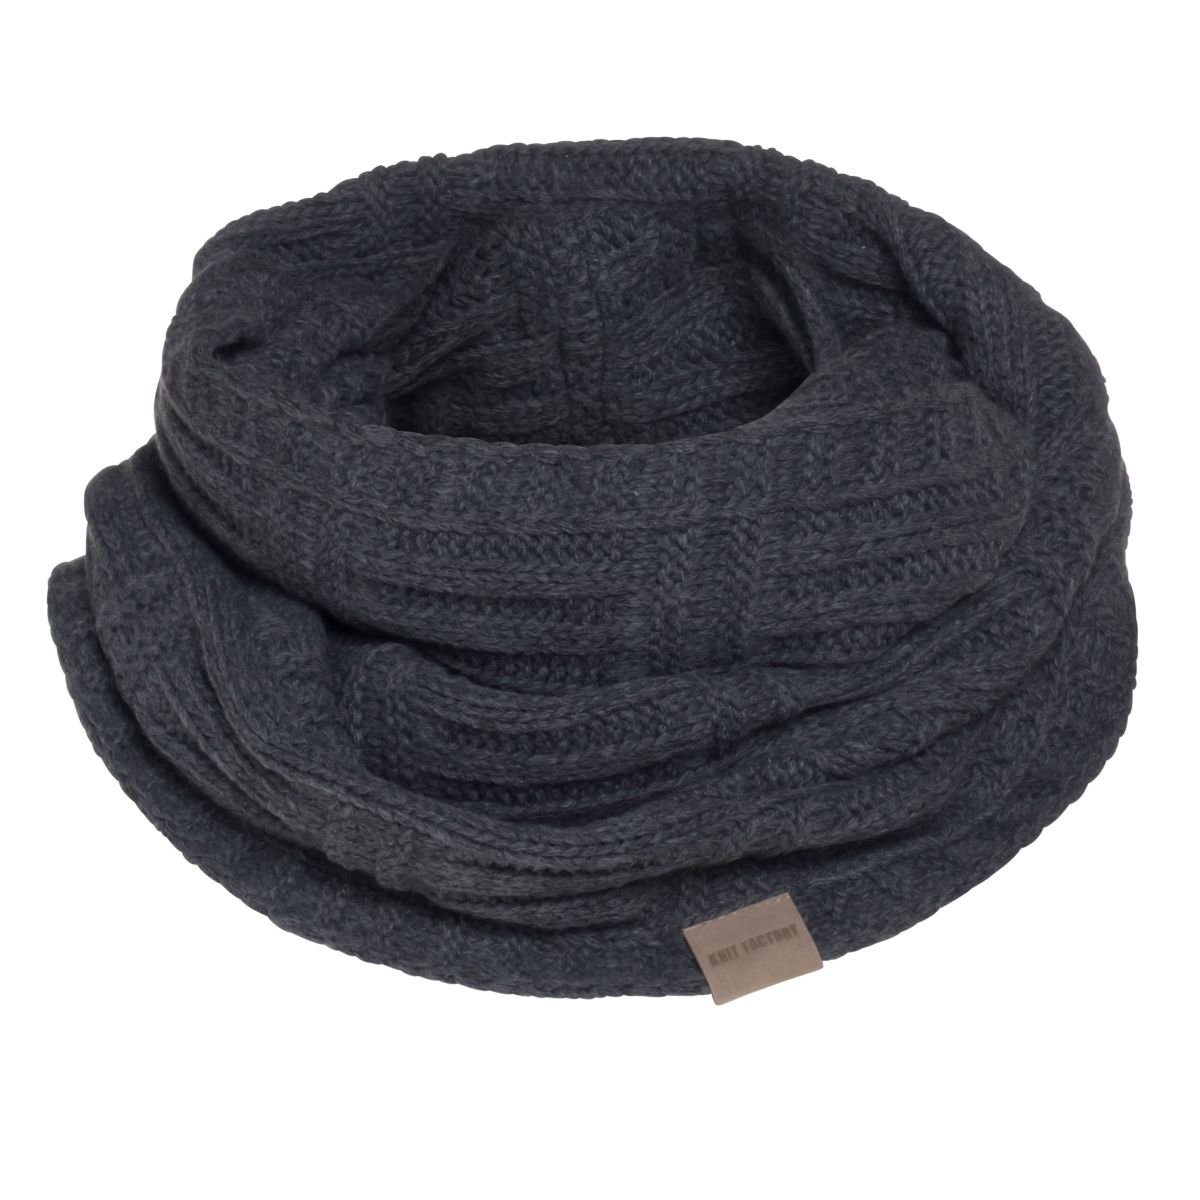 bobby infinity scarf anthracite